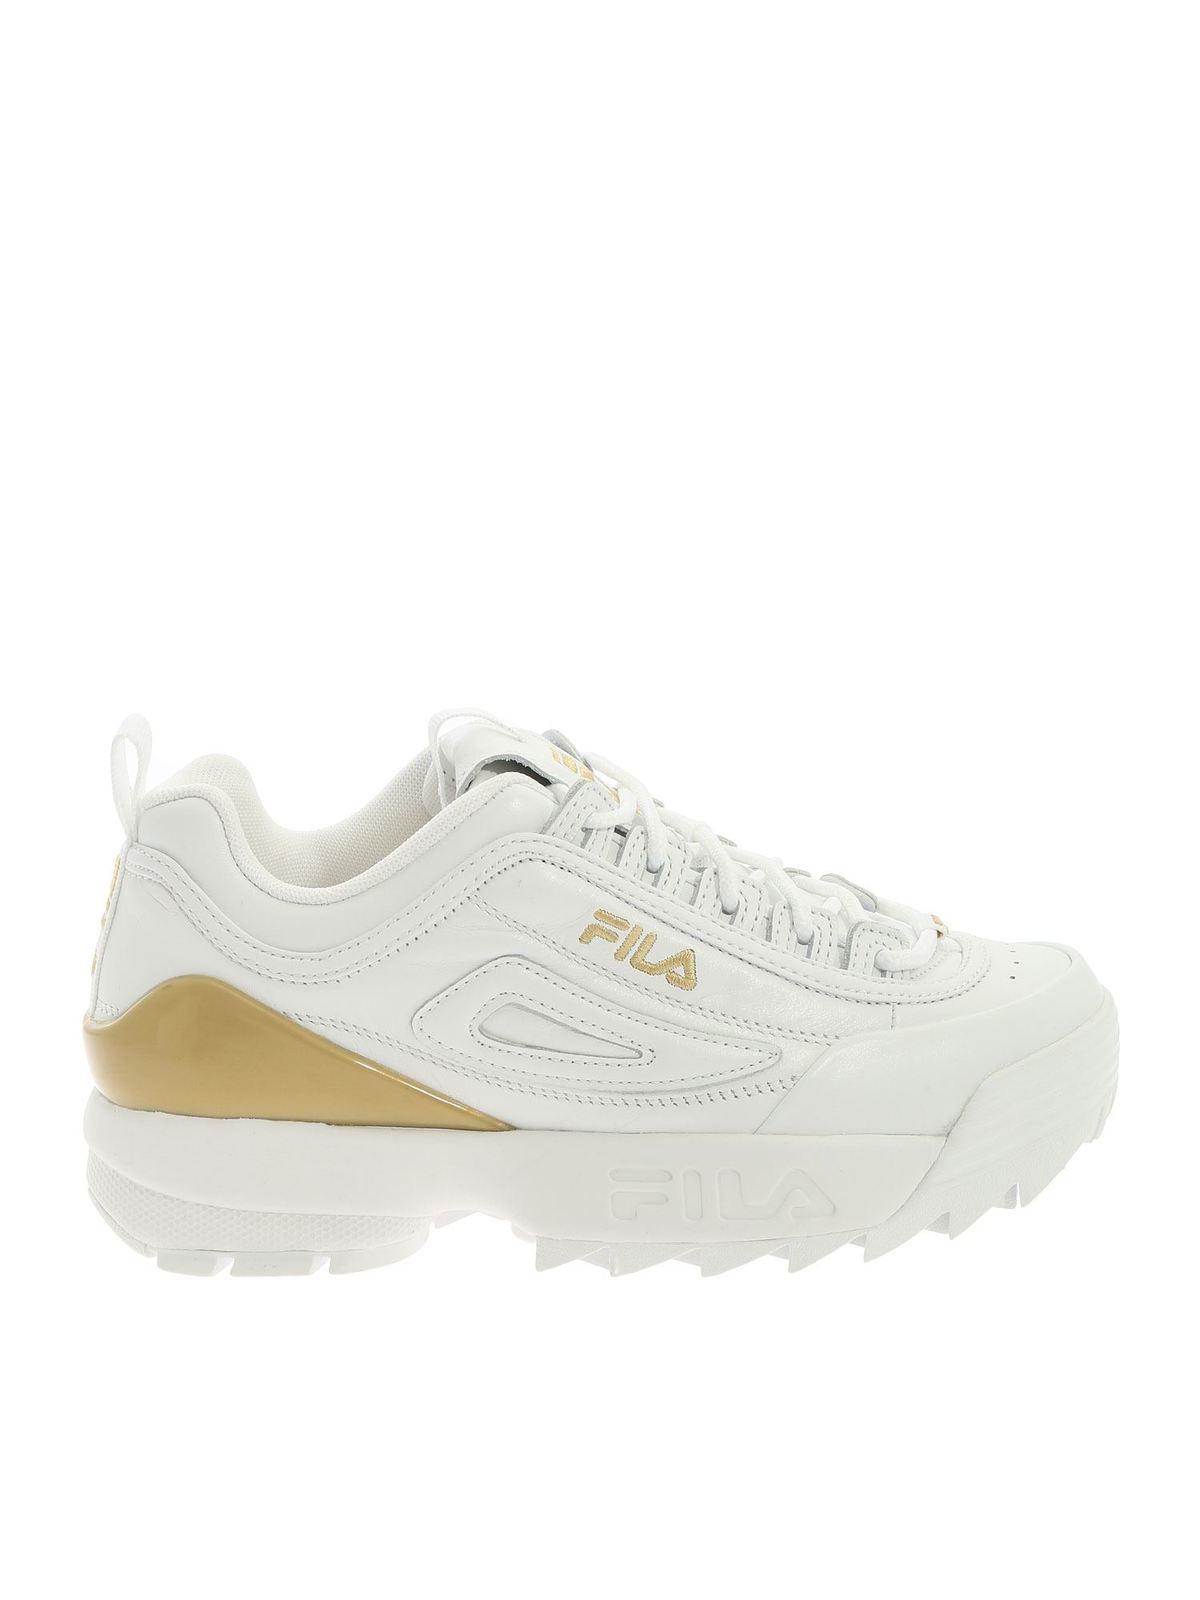 fila trainers gold